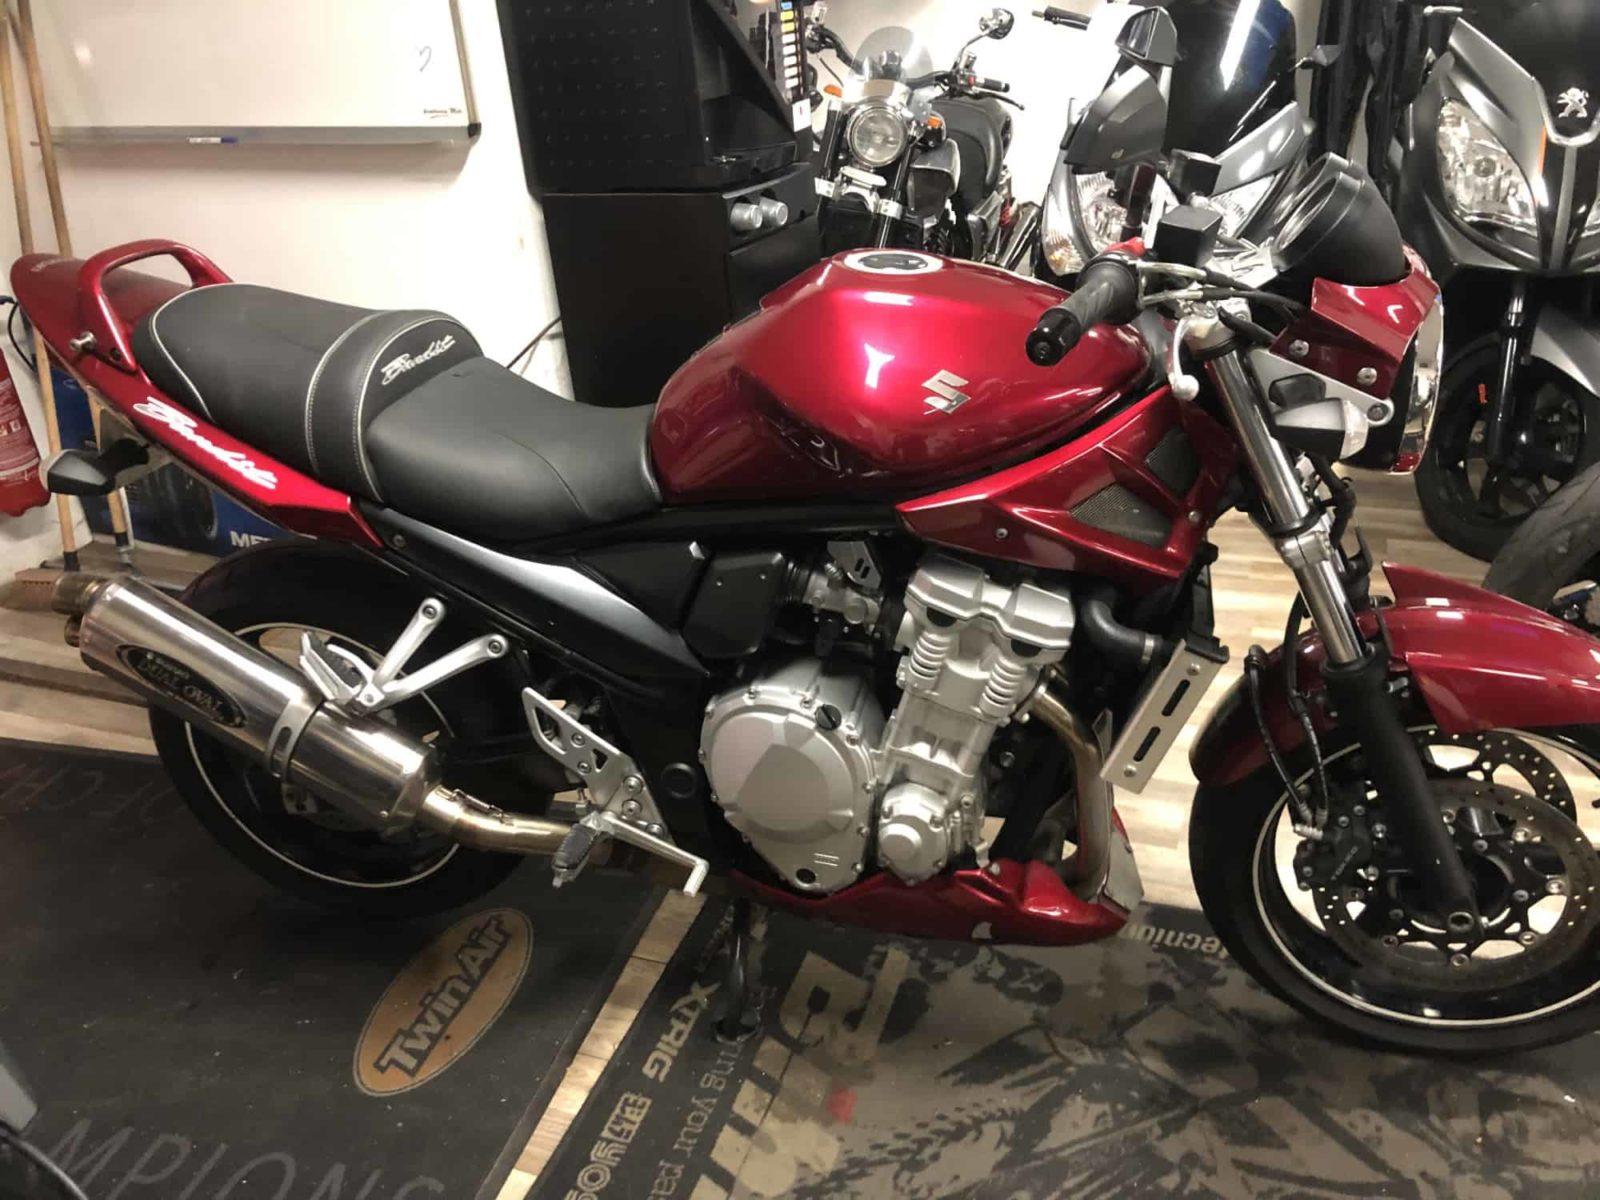 Vendu ! Suzuki Bandit 650 – 3500€